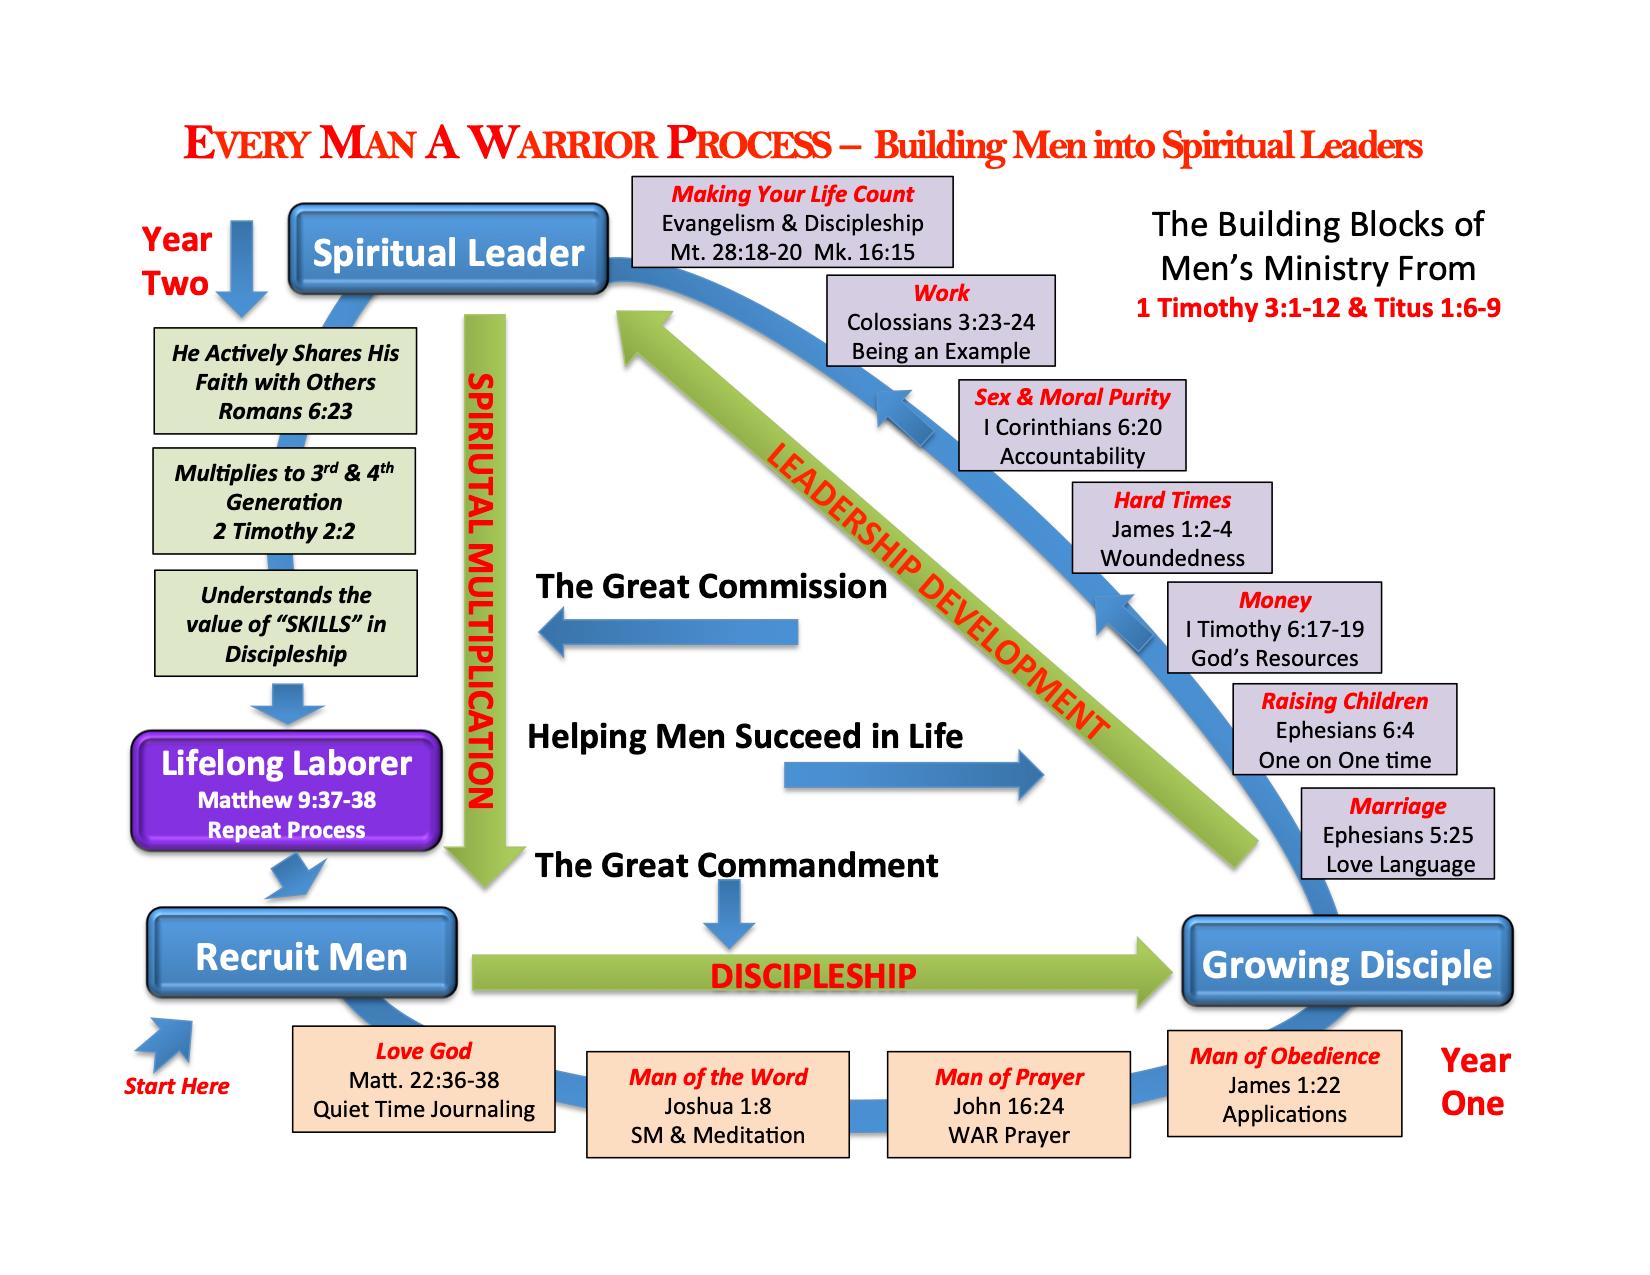 EMAW Process Chart